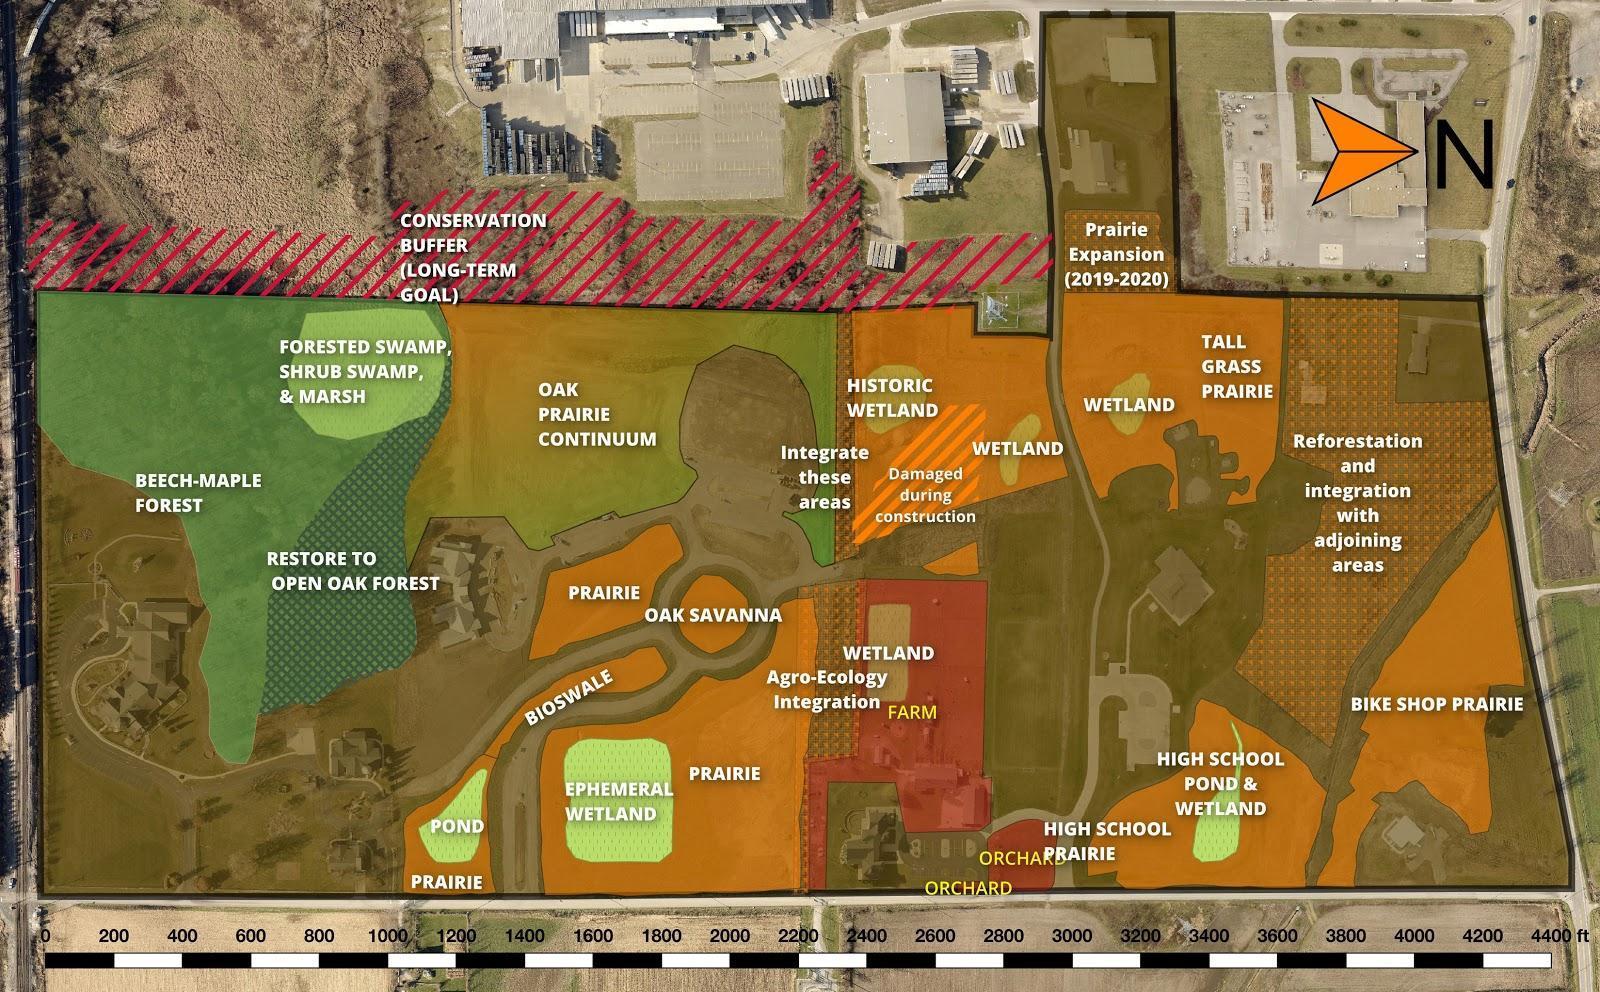 bio diversity map